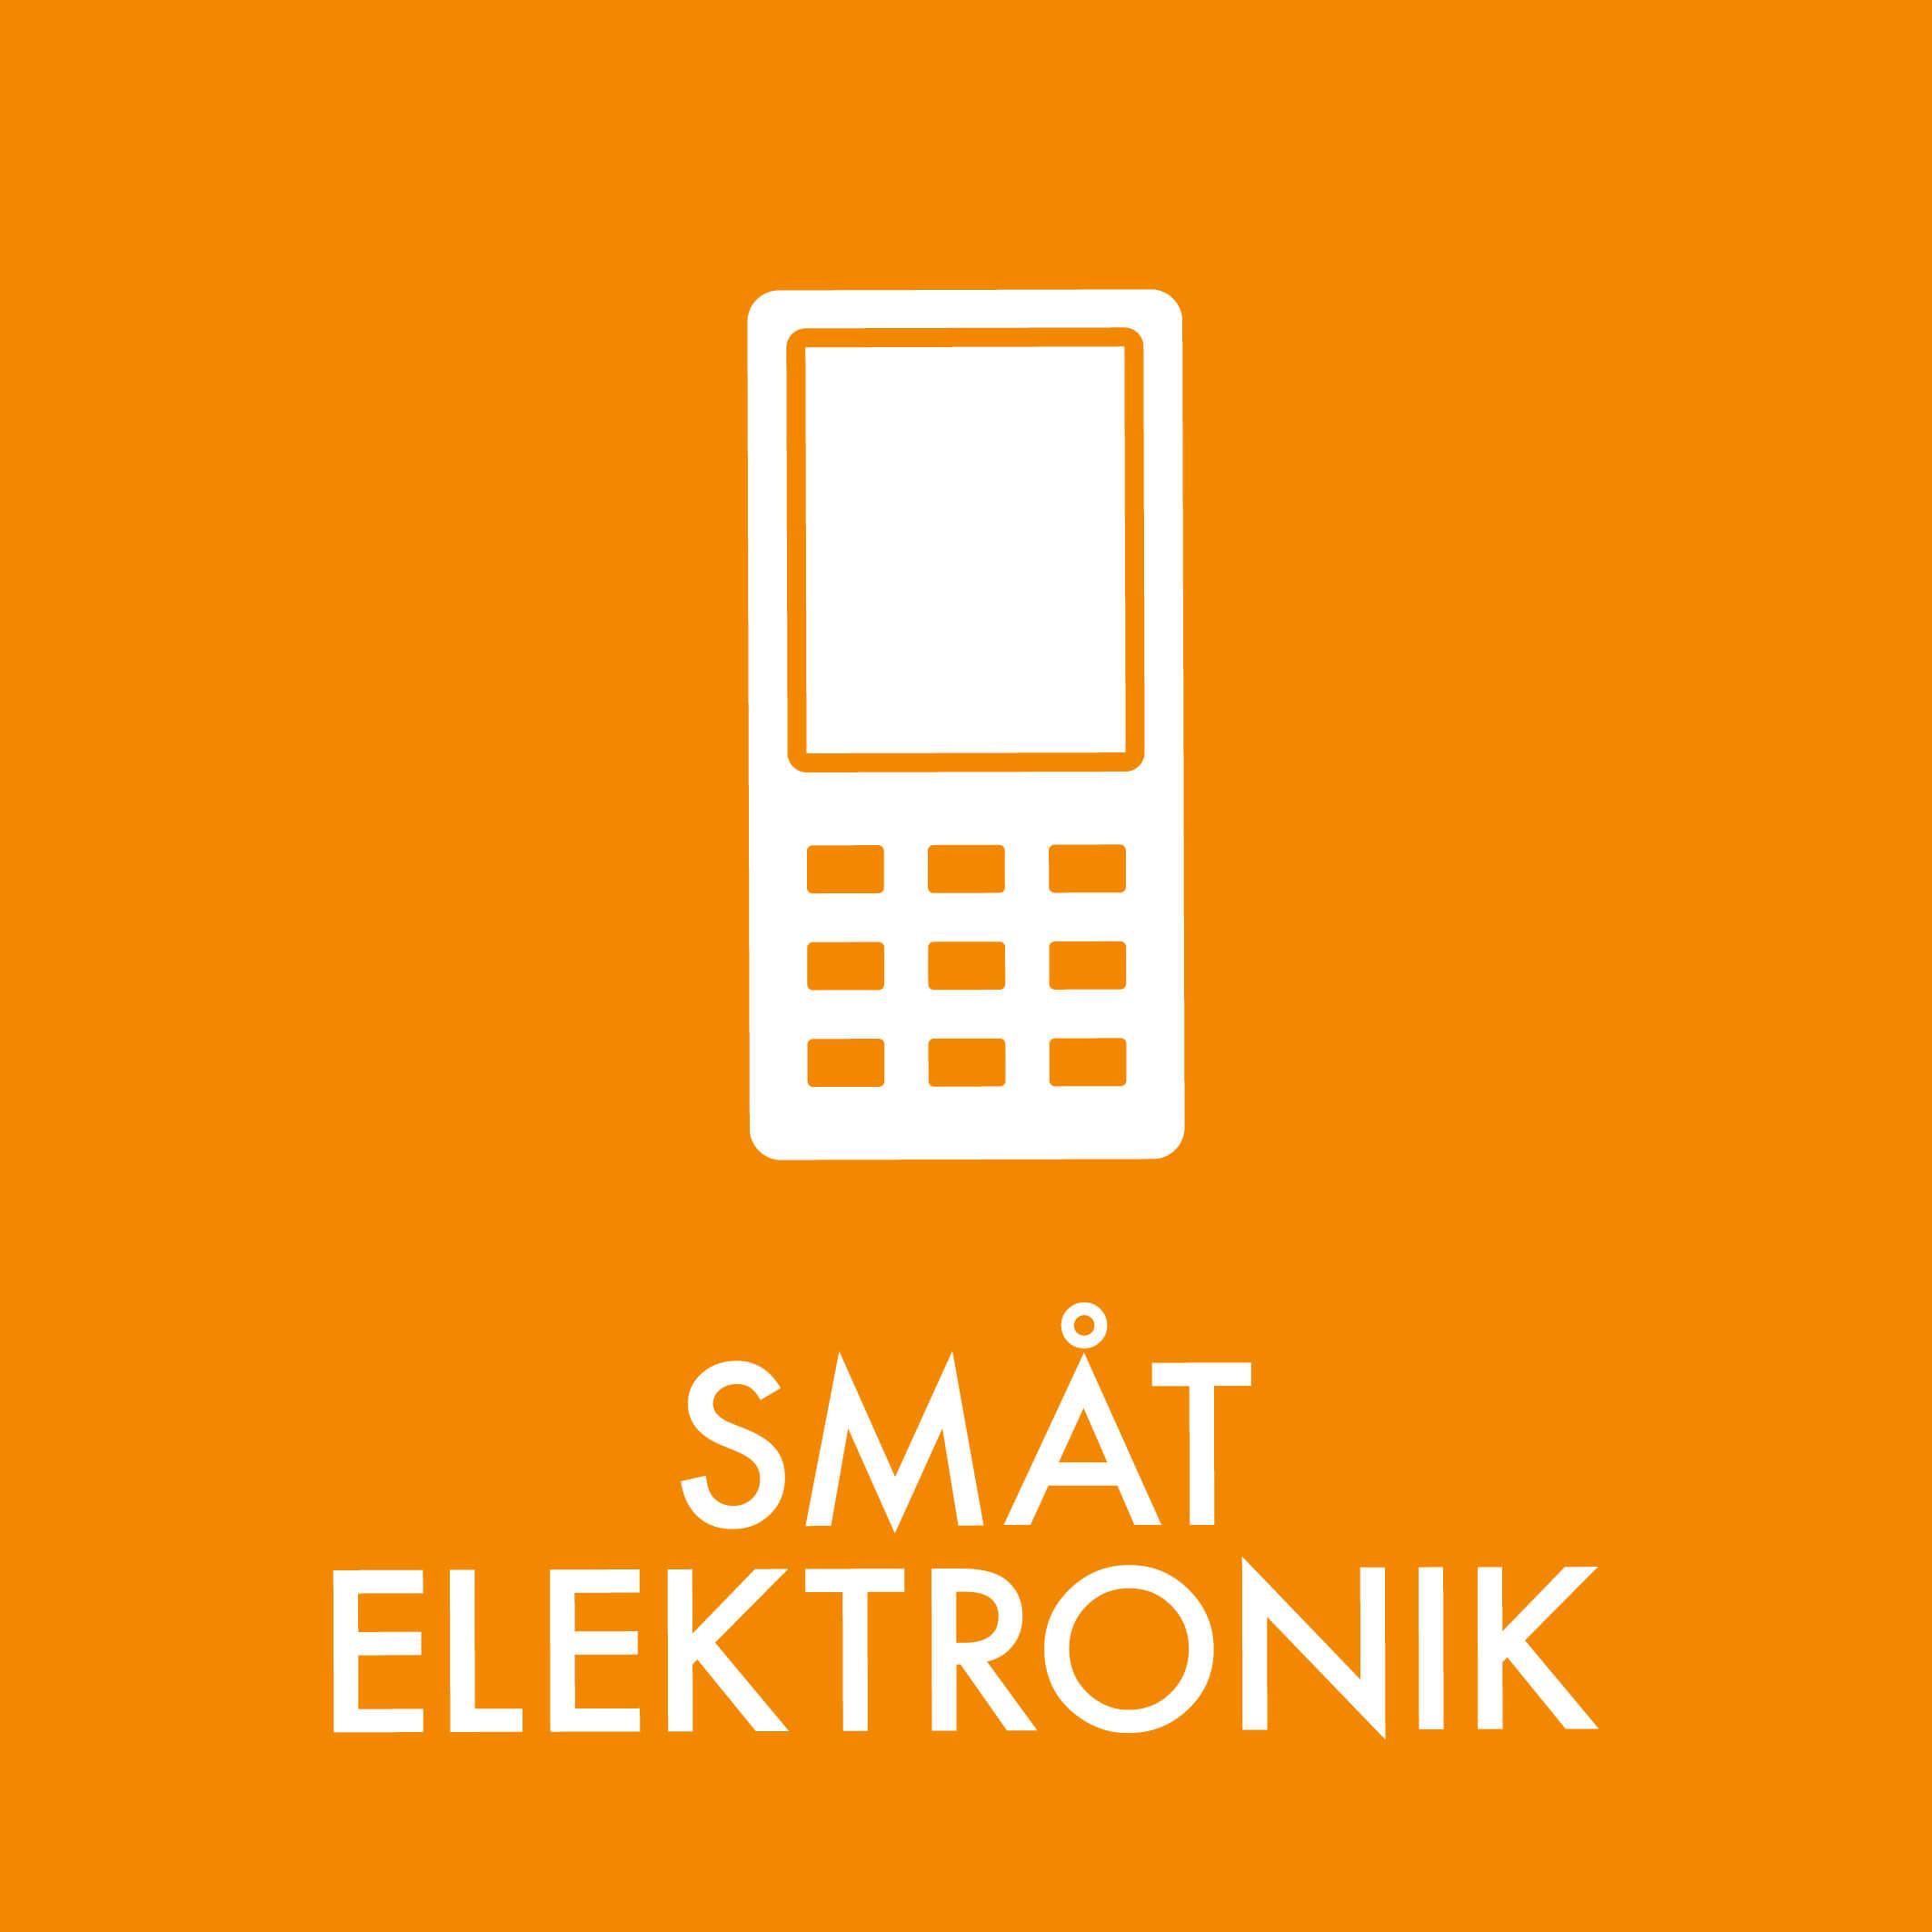 Dansk Affaldssortering - Småt elektronik